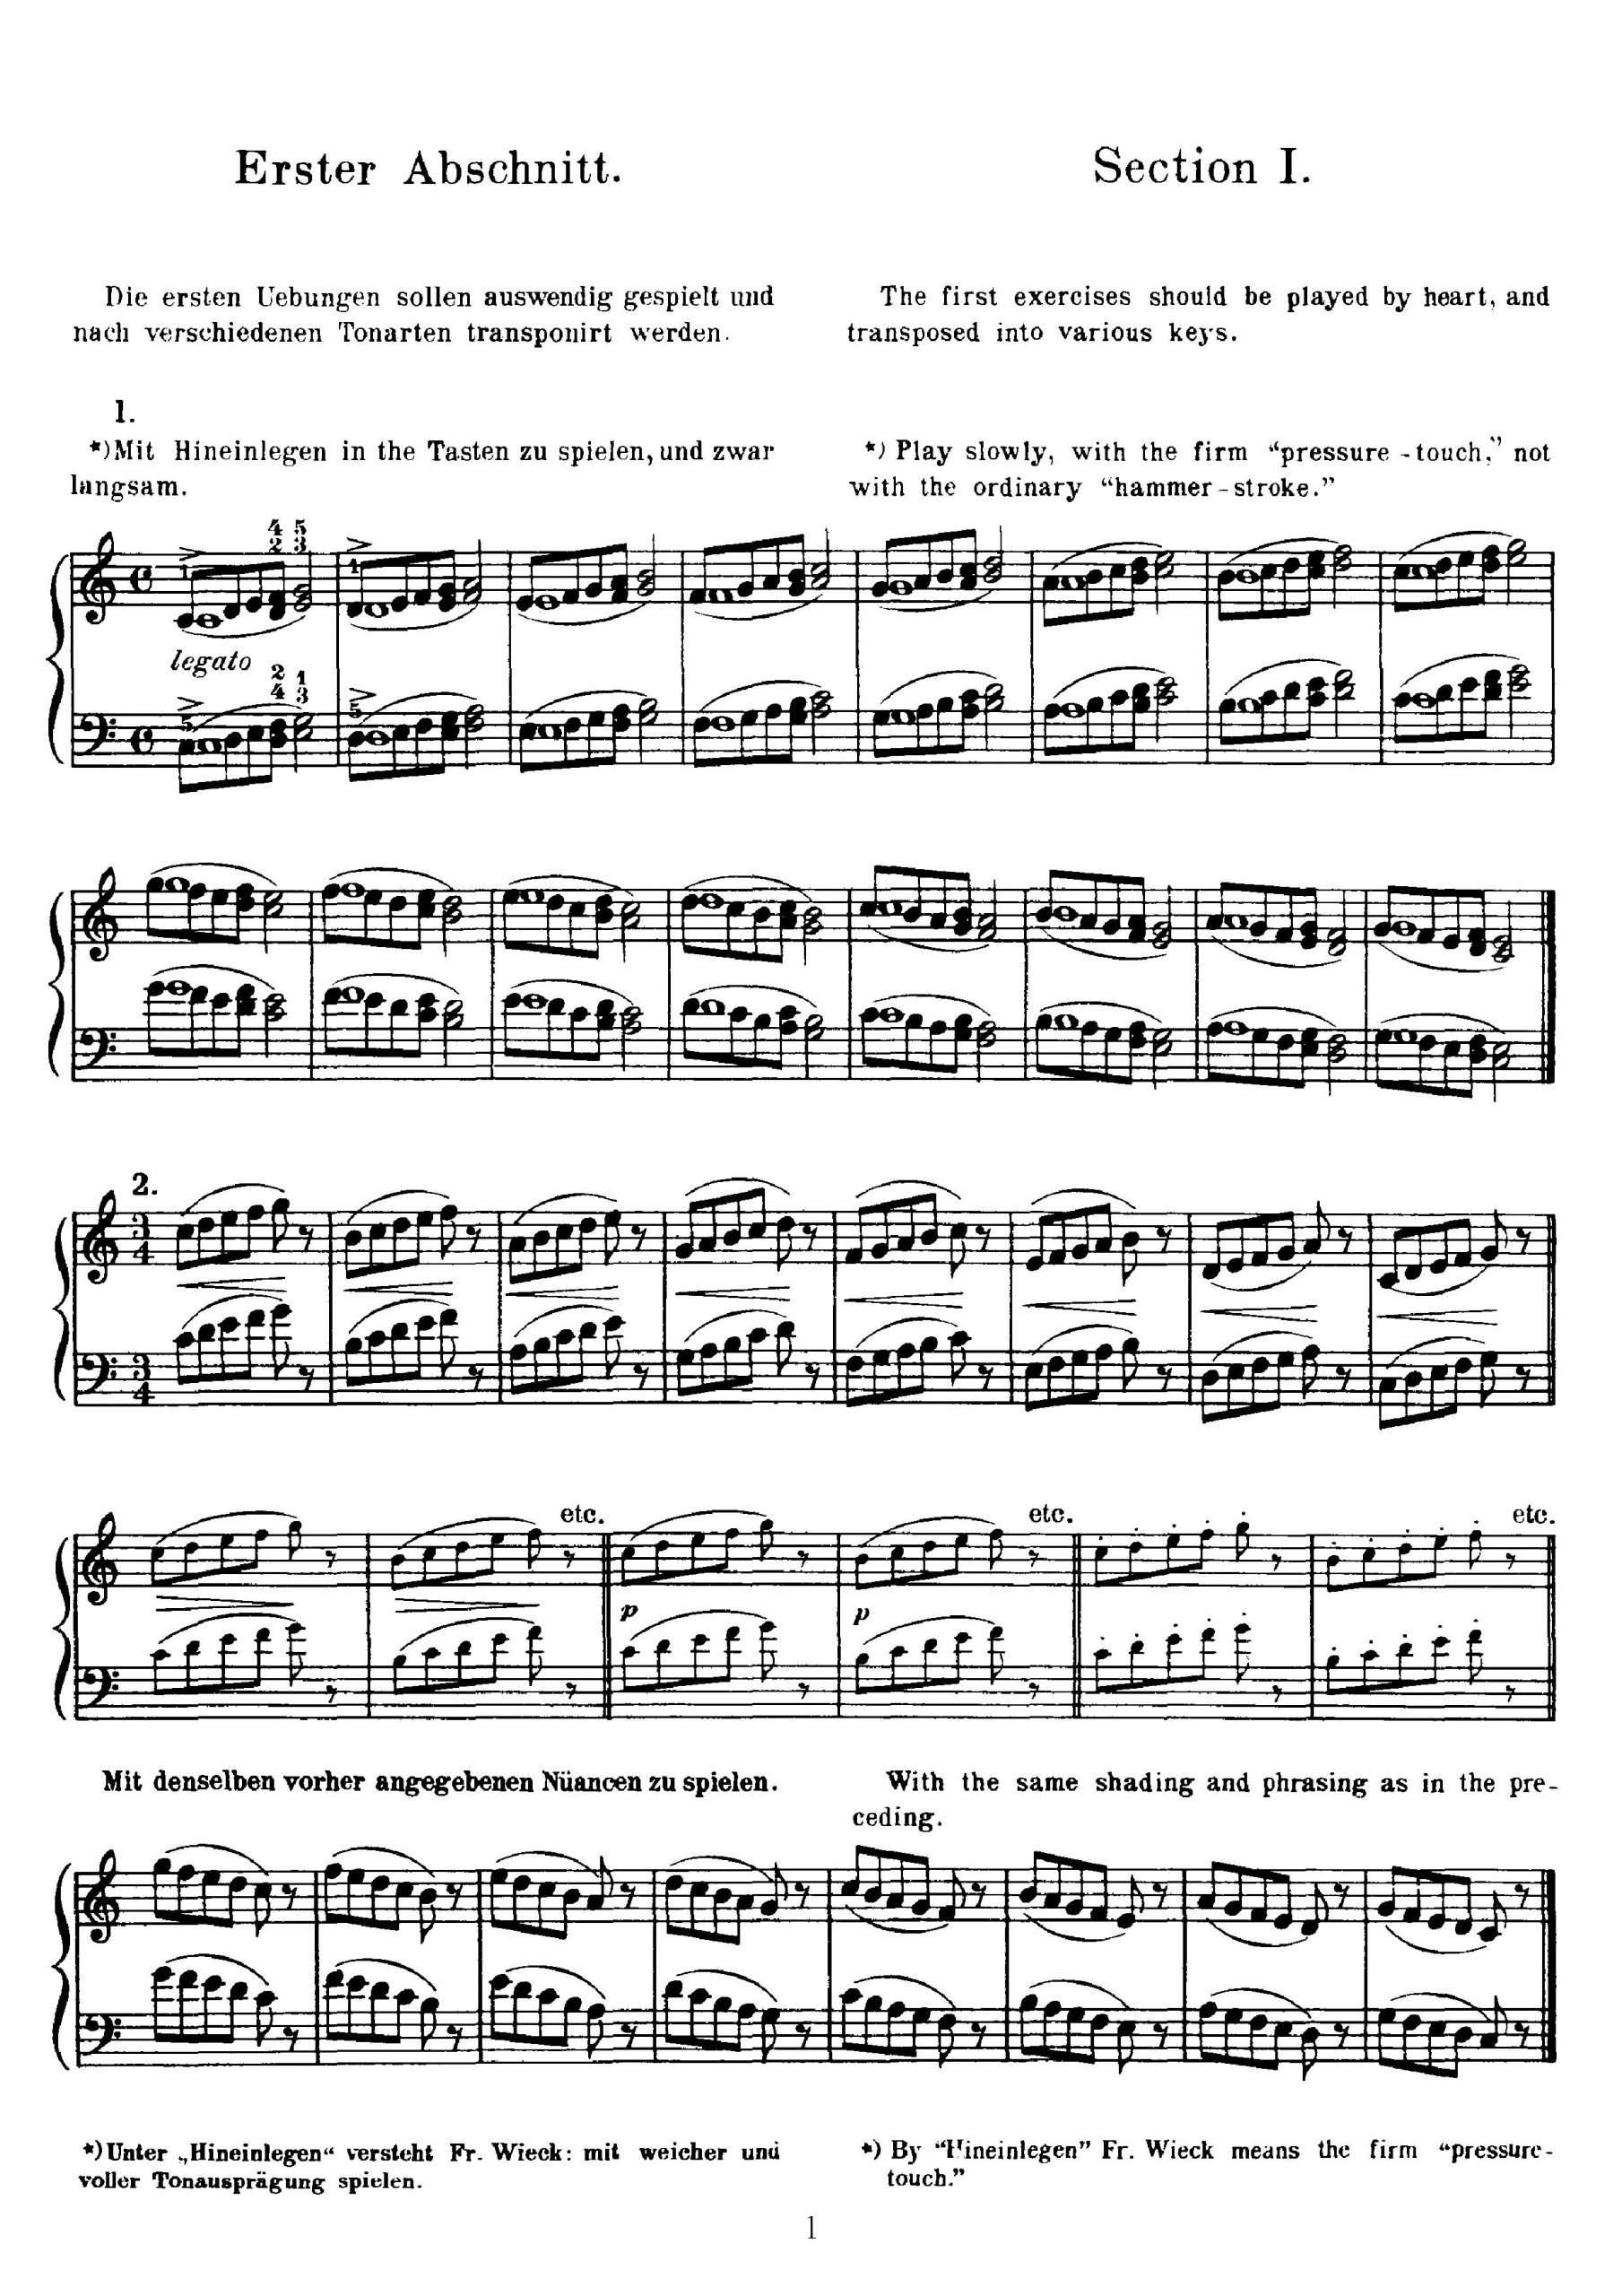 Wieck, Friedrich - Piano Studies